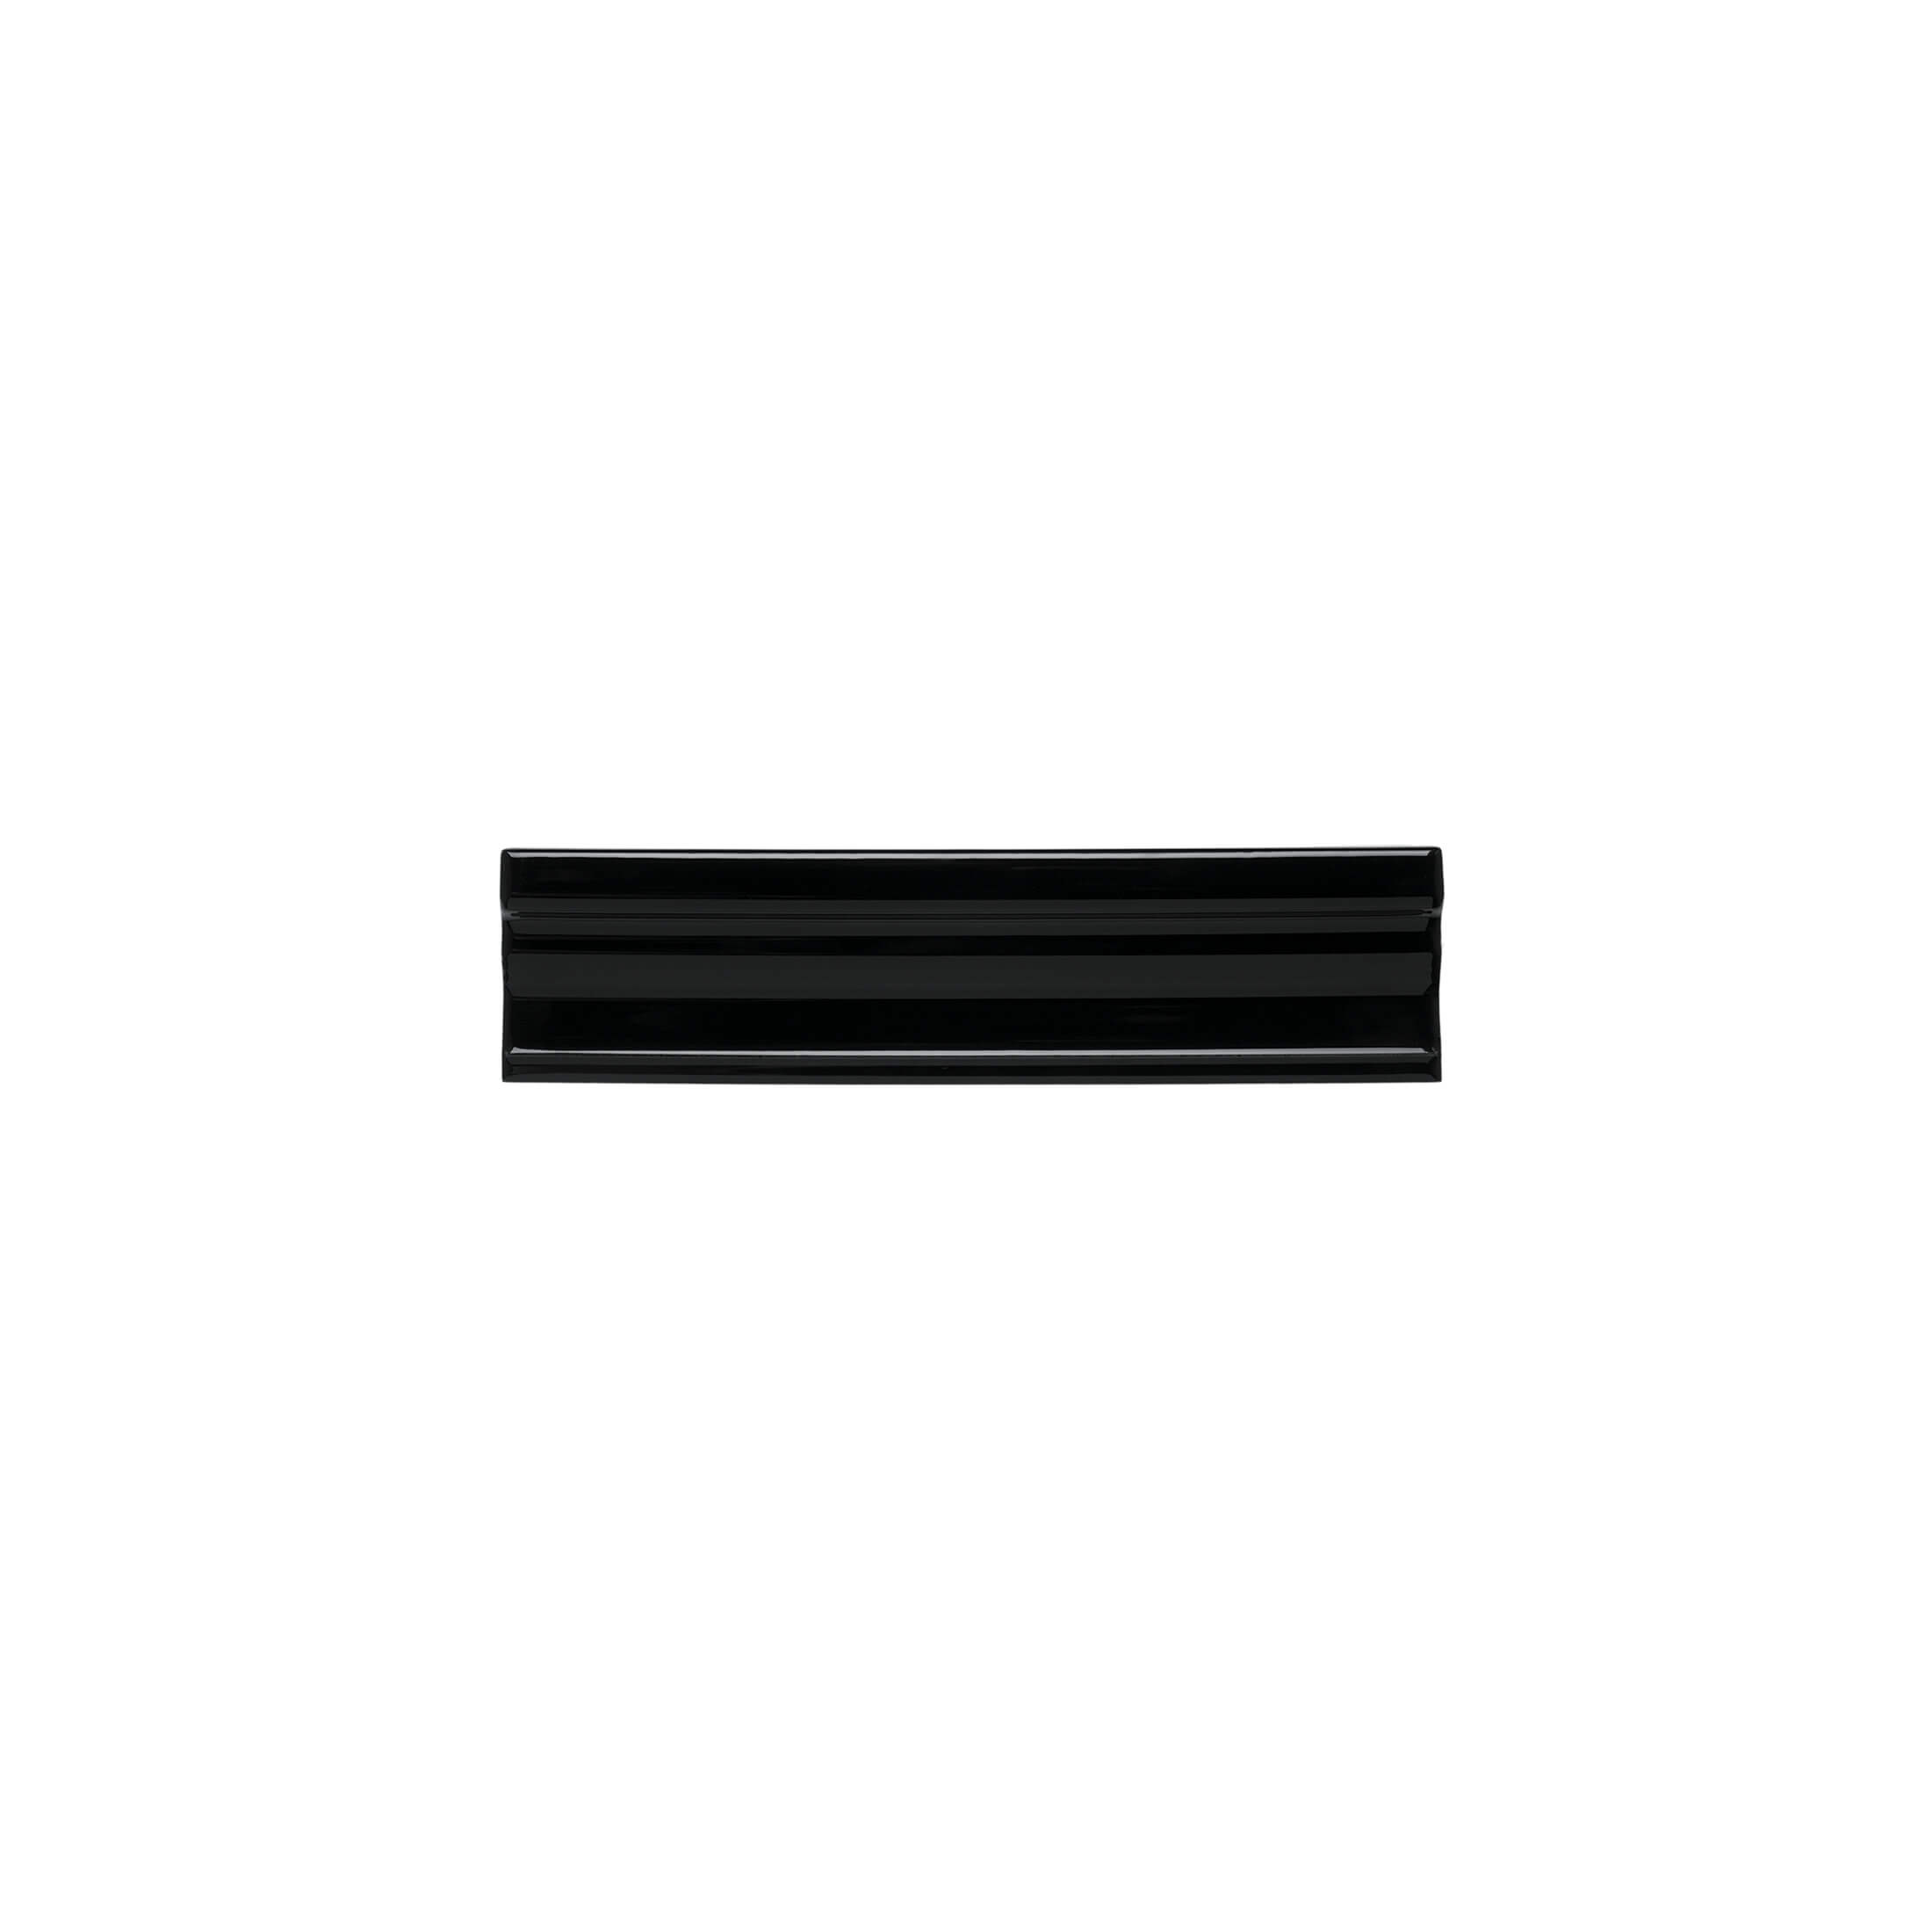 ADNE5439 - CORNISA CLASICA - 3.5 cm X 15 cm